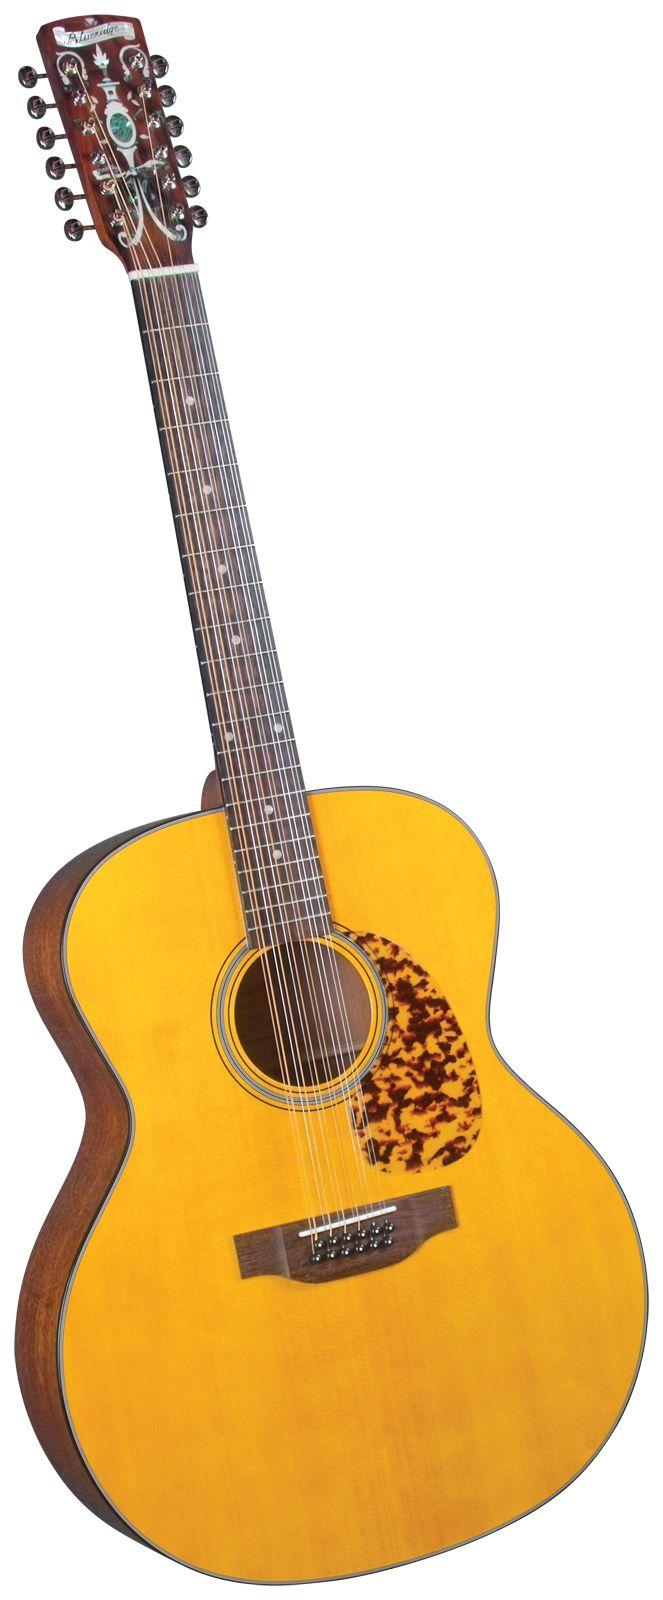 blueridge br 140 12 historic series jumbo 12 string guitar ooh mama likes acoustic guitar. Black Bedroom Furniture Sets. Home Design Ideas